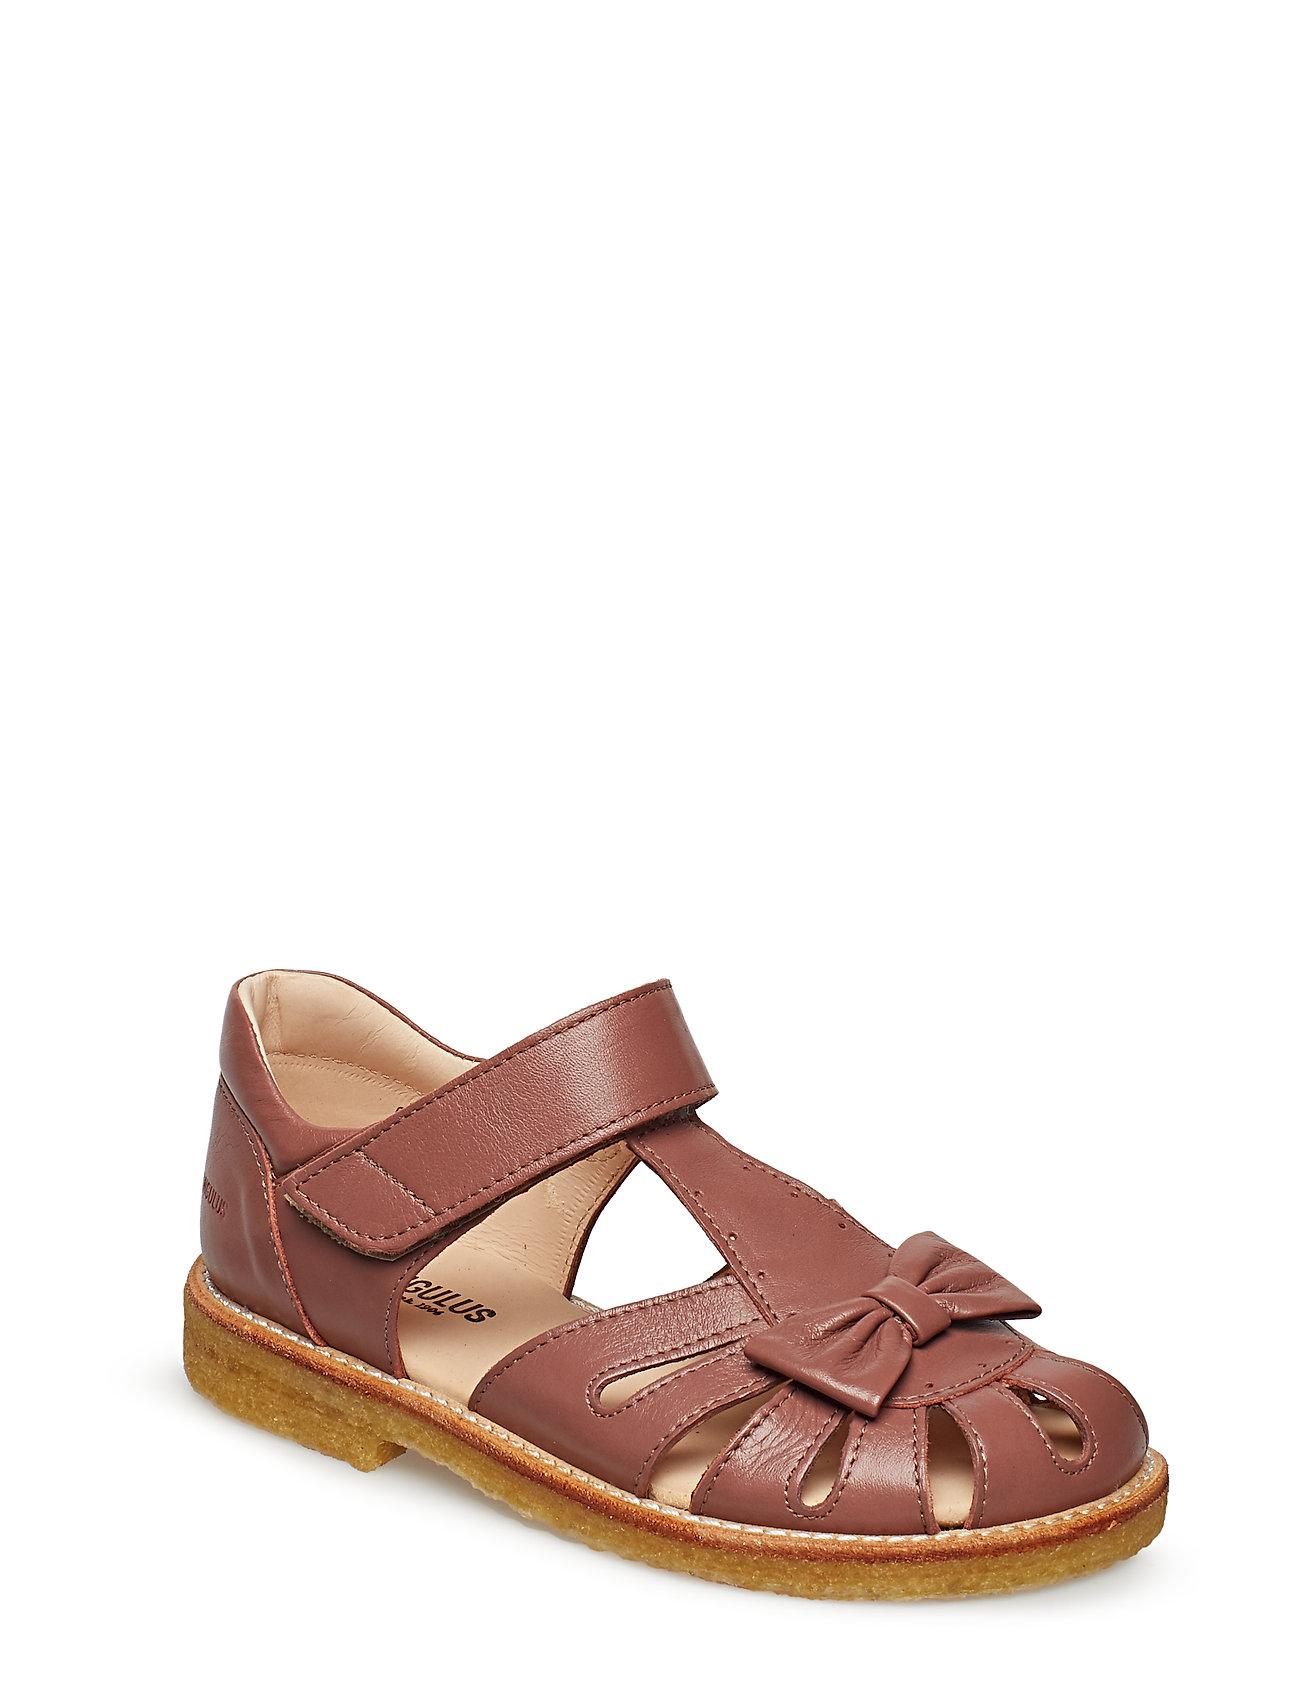 0d1a31b9a06 ANGULUS Sandals - Flat (1524 Plum), (87.50 €) | Large selection of ...